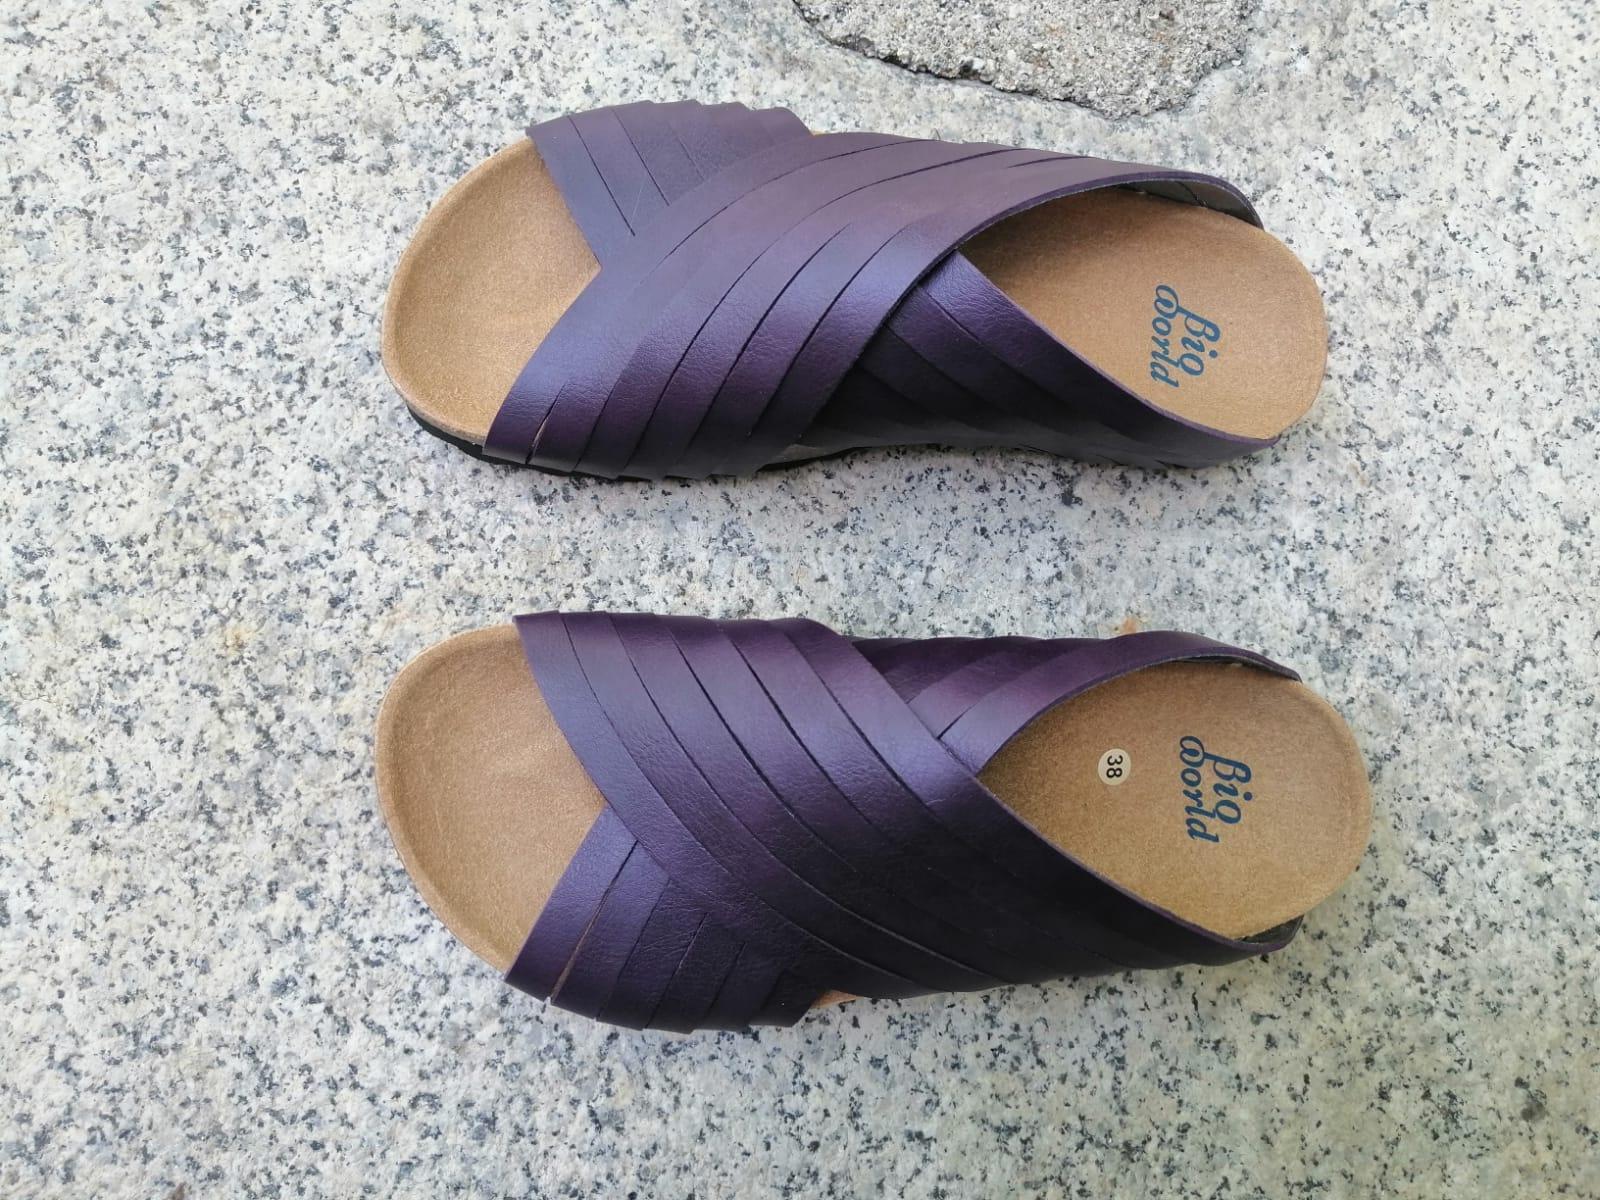 Jerusalem deep purple. sandalias veganas, sandalias veganas mujer, calzado vegano, sandalias de tacón bajo, sandalias bioworld, vegan shoes.